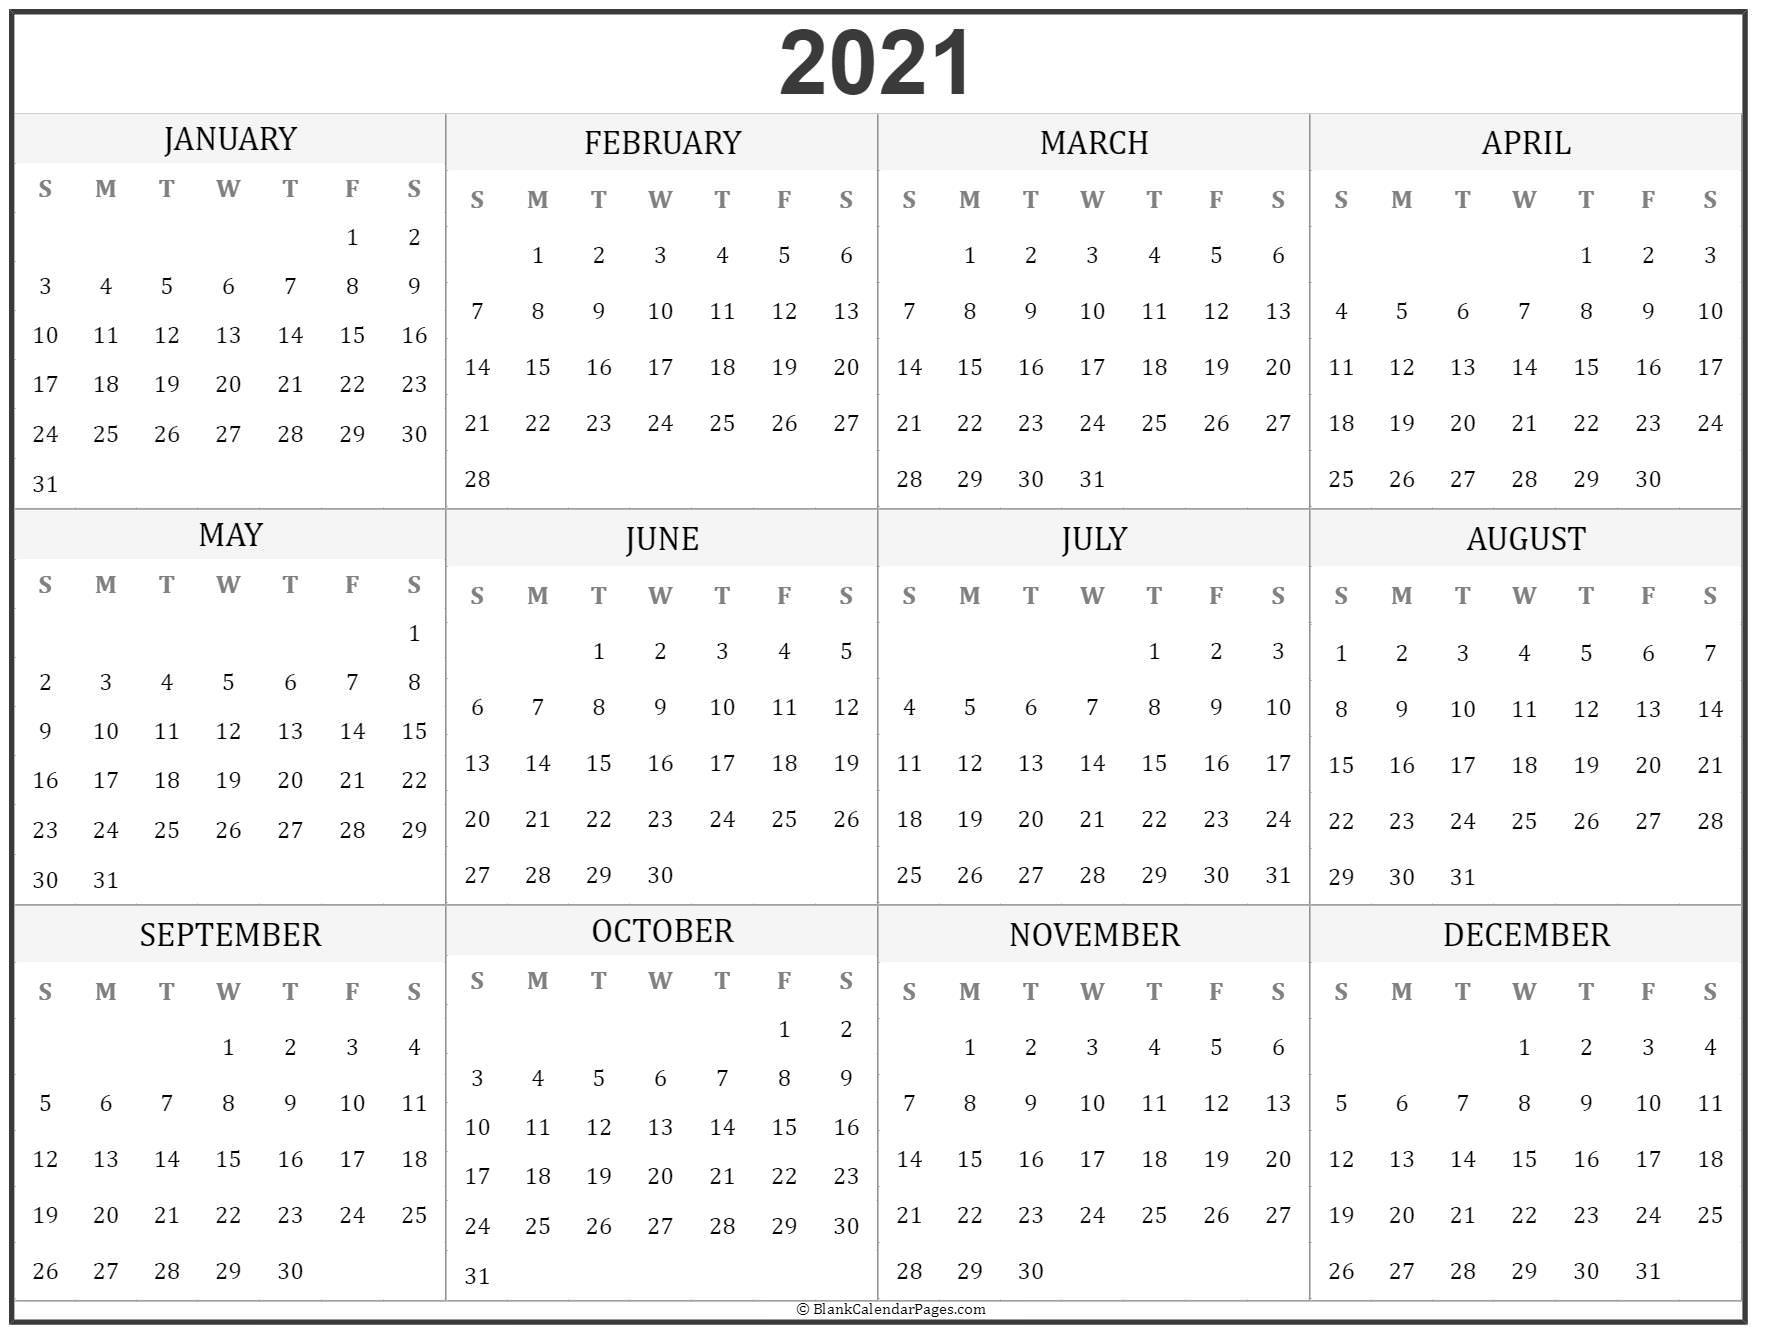 2021 Year Calendar | Yearly Printable pertaining to Blank 2021 Calendar Printable Free